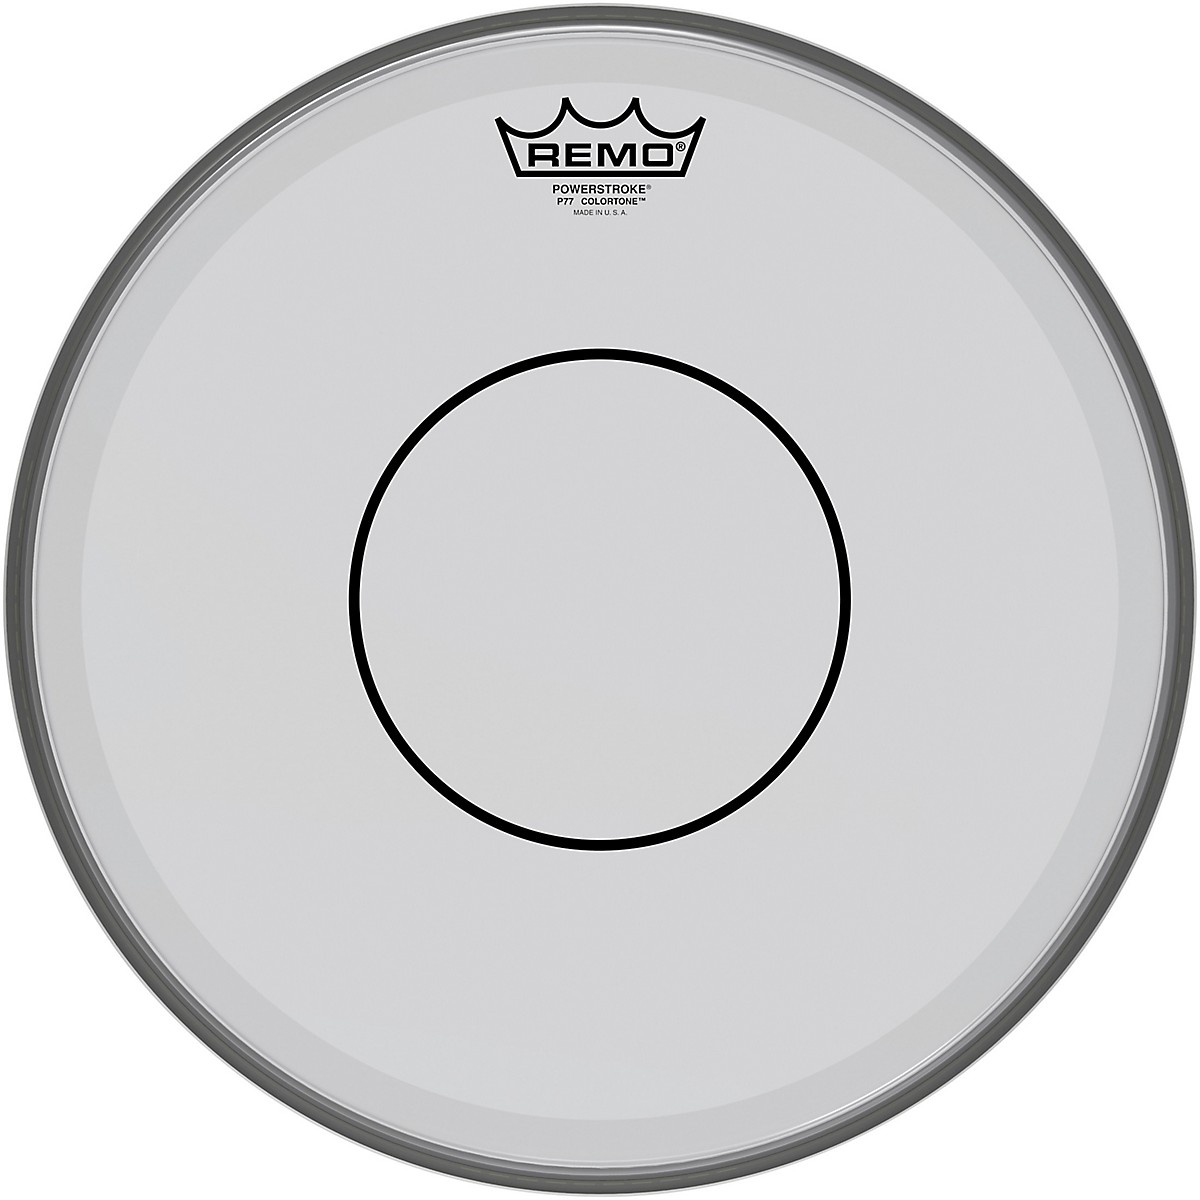 Remo Powerstroke 77 Colortone Smoke Drum Head